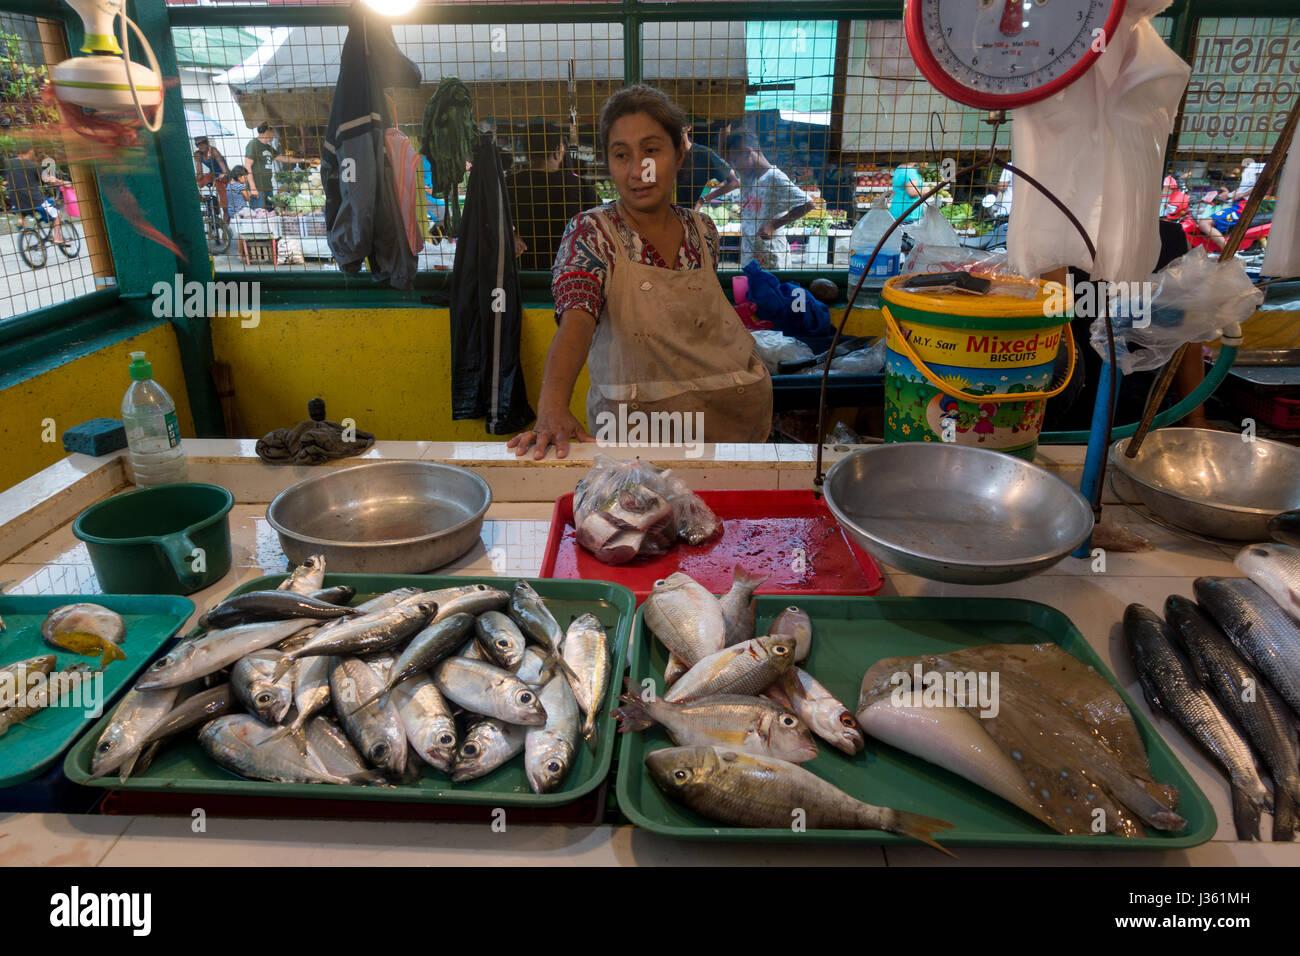 Fish aquarium market in delhi - Polillo Island Philippines April 30 2017 Stingray And Other Fish Displayed For